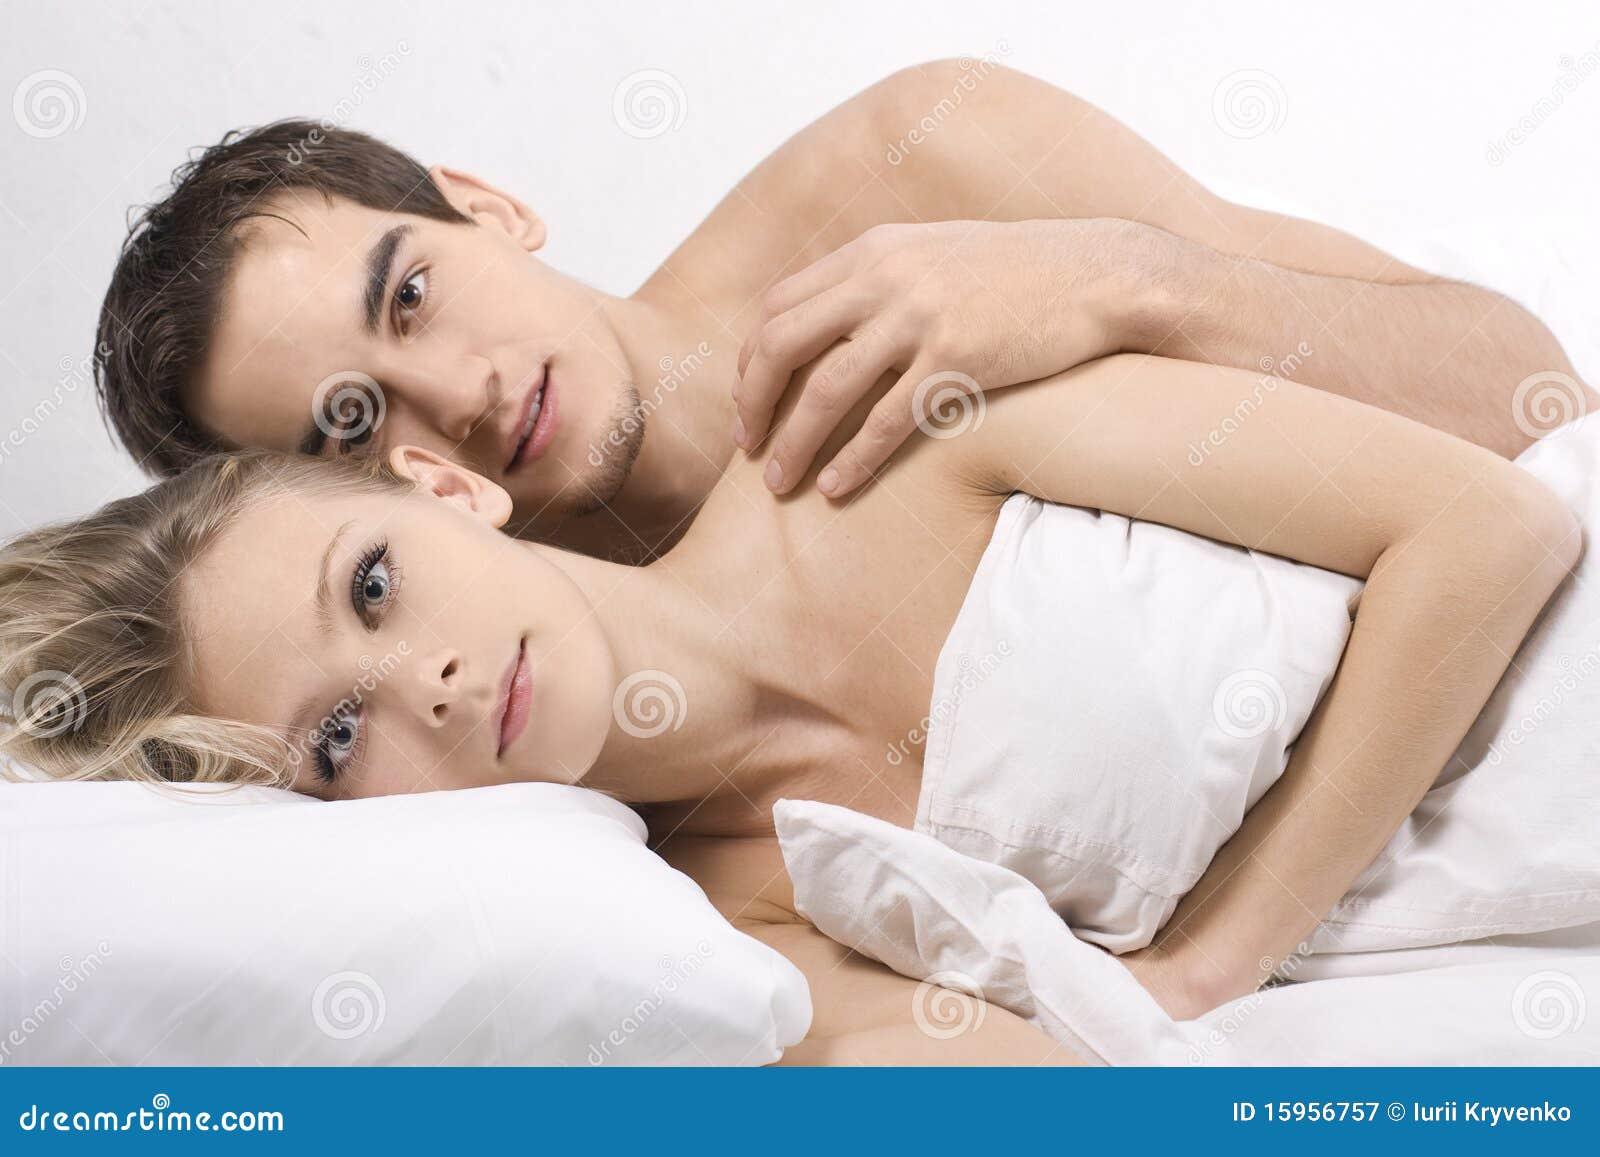 couples sleeping nude together